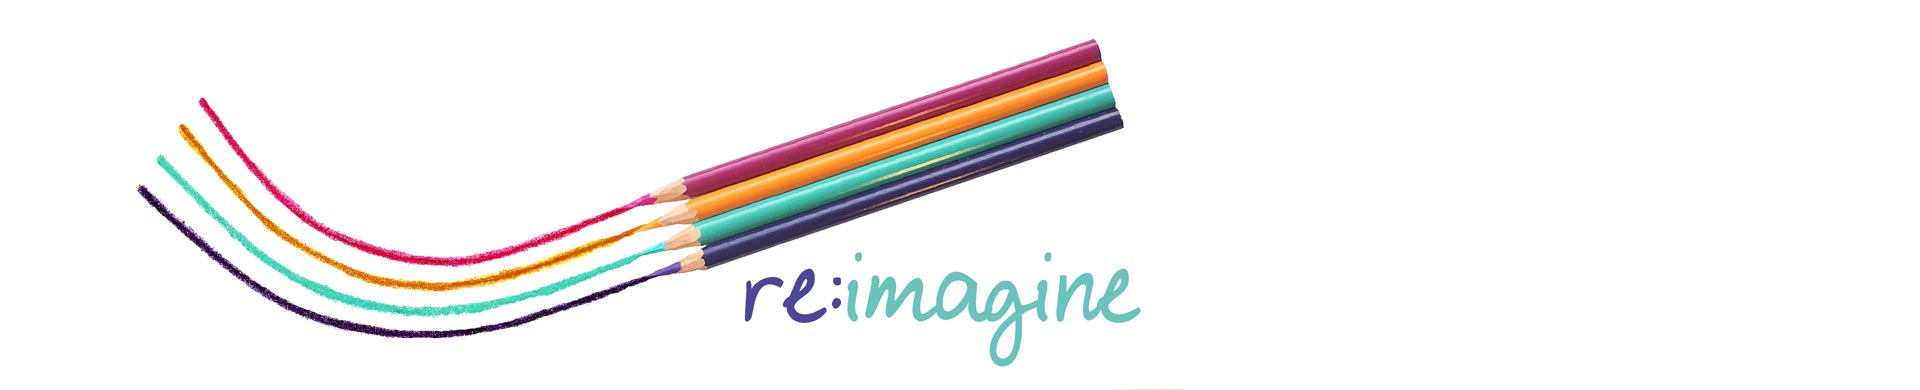 reimagine-background